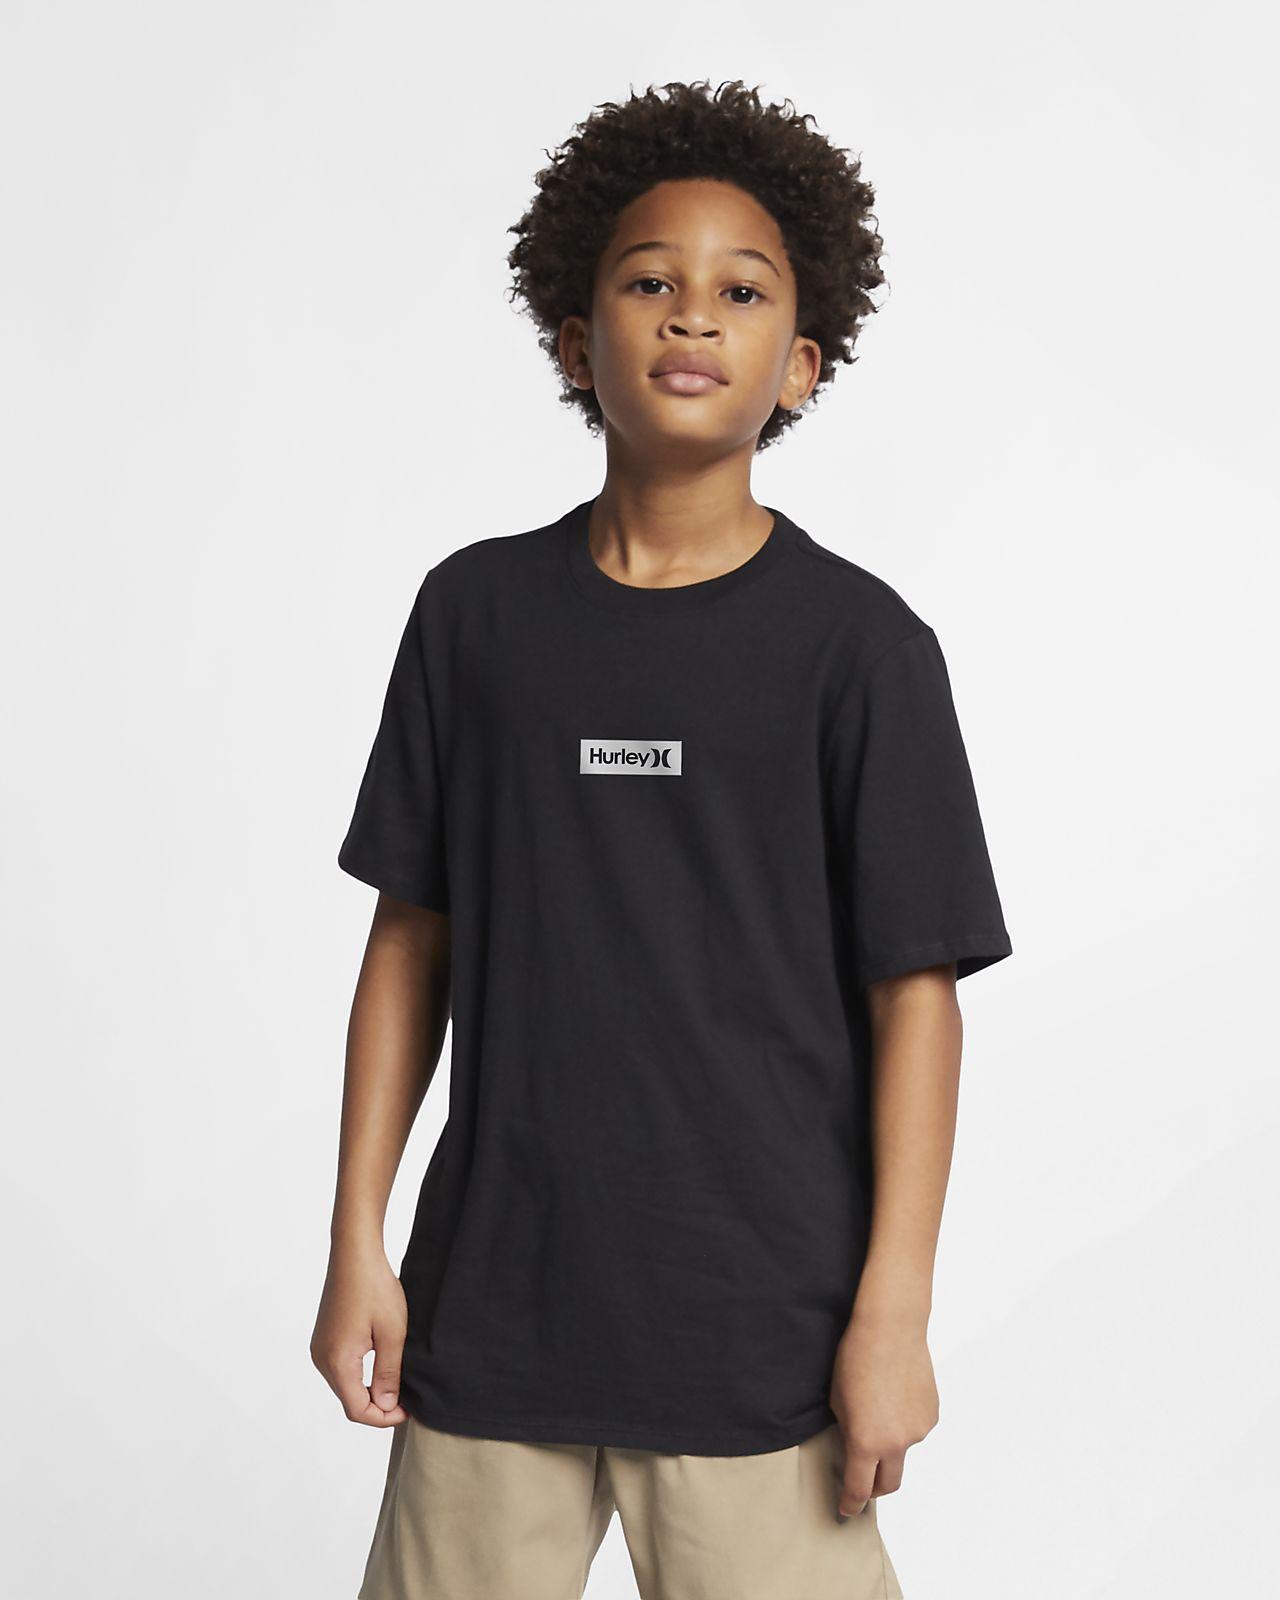 Tee-shirt Hurley Premium One And Only Small Box pour Garçon